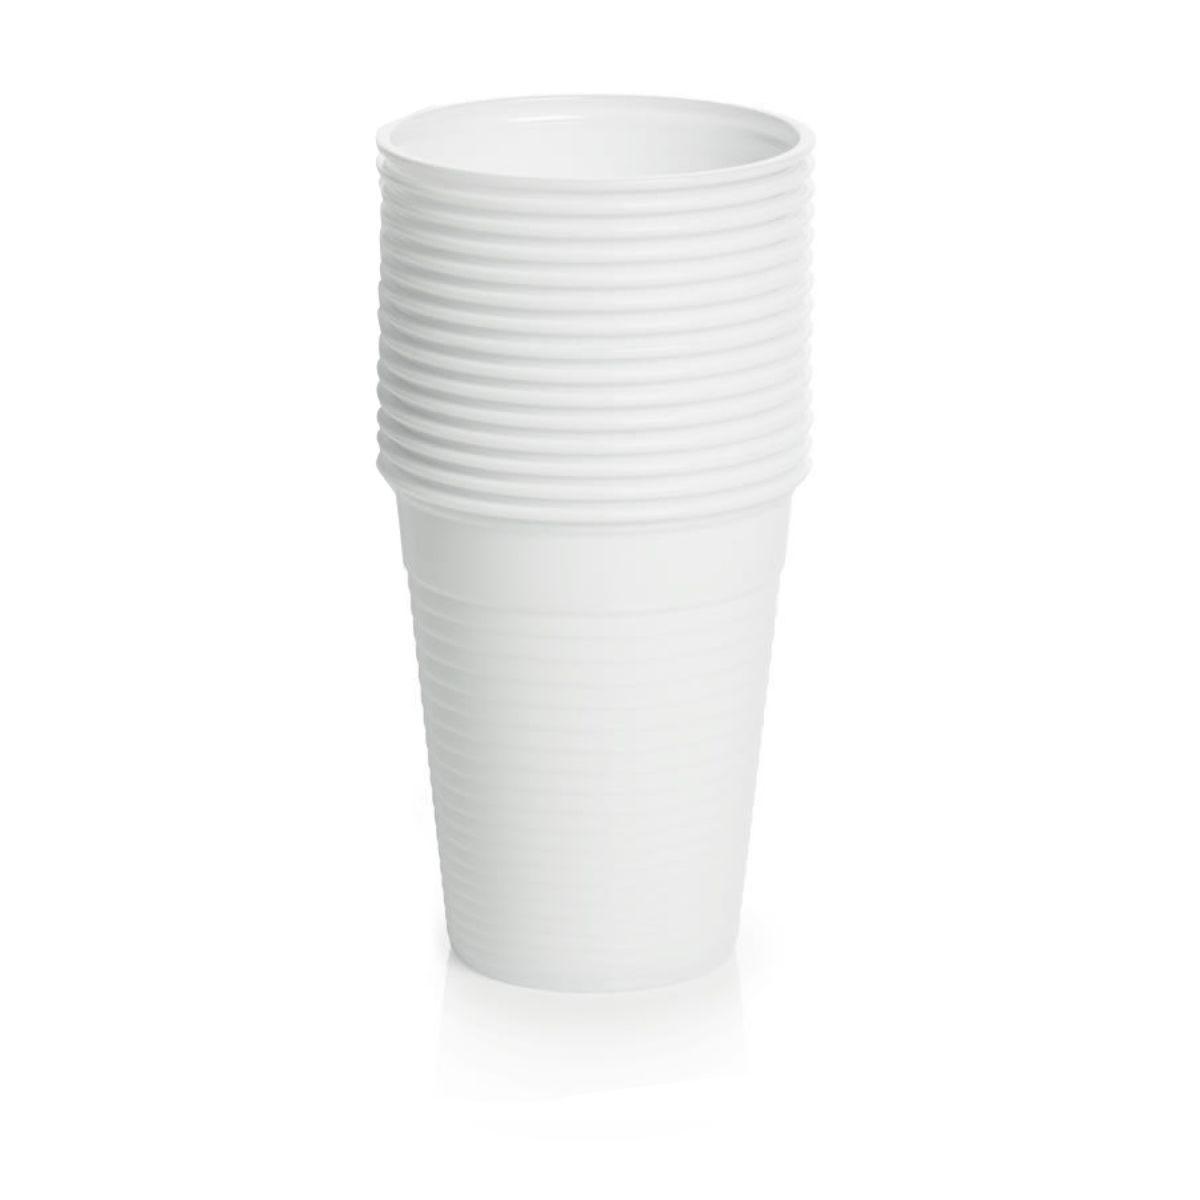 Essential Plastic White Cups  15 Pack